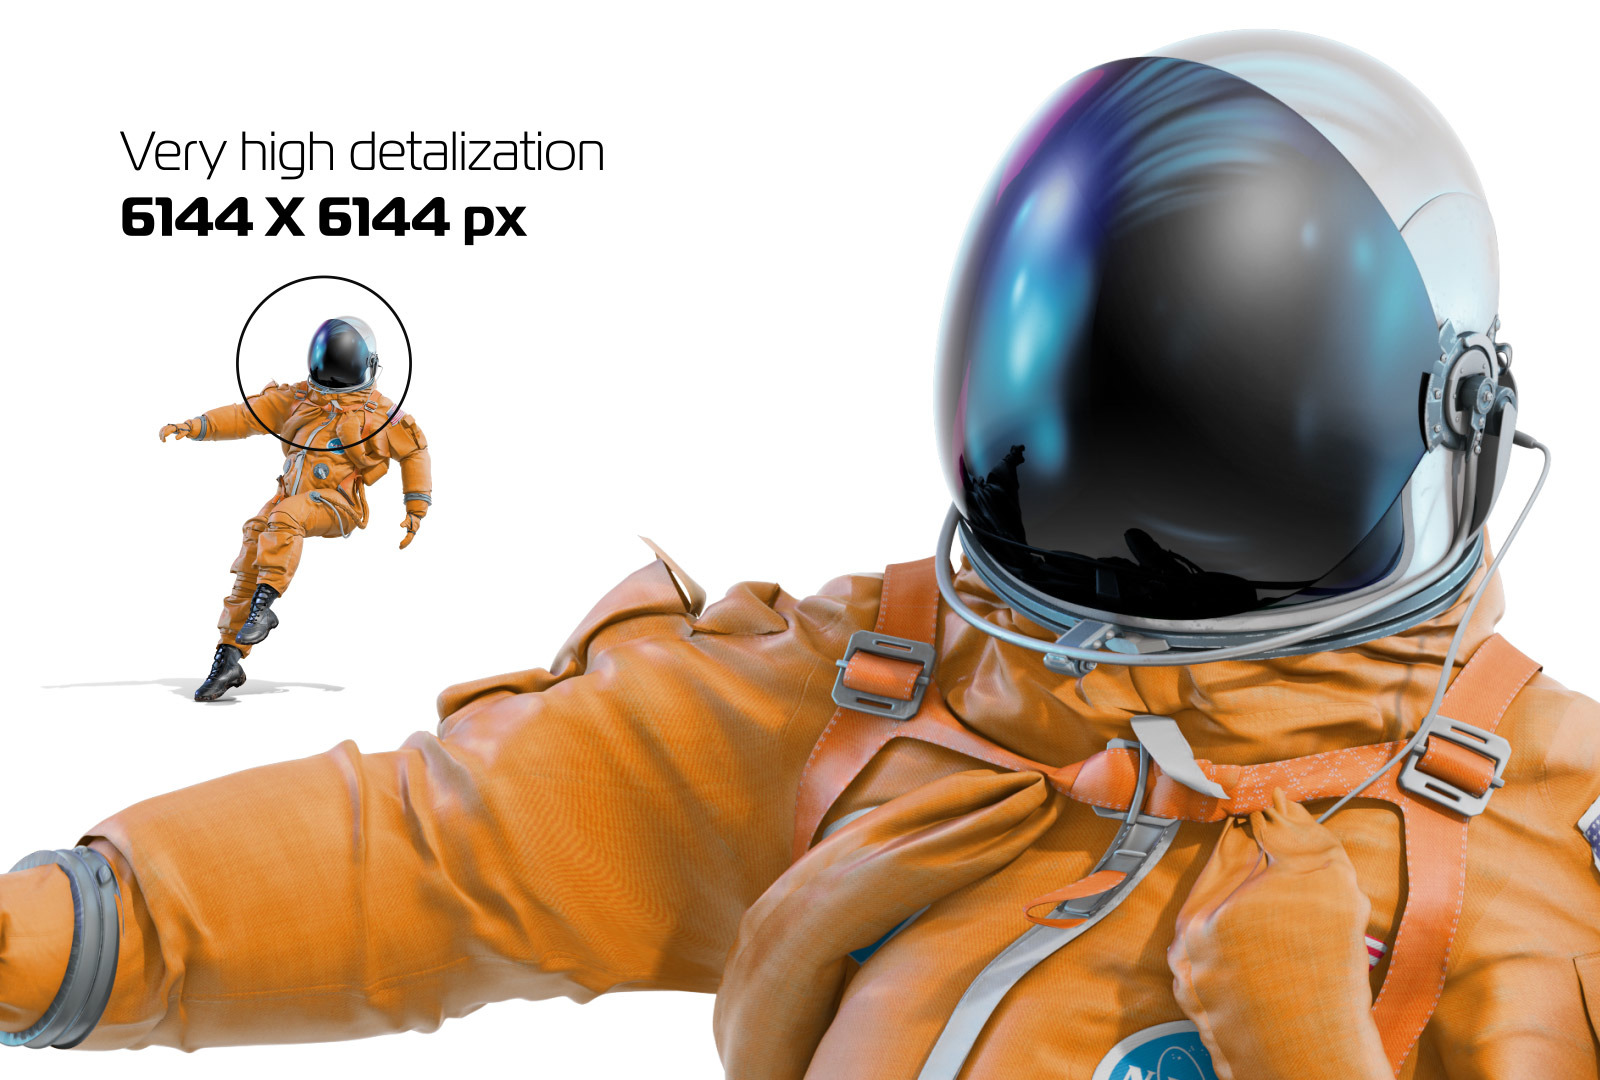 PSD Mockup 3D model NASA Astronaut #36